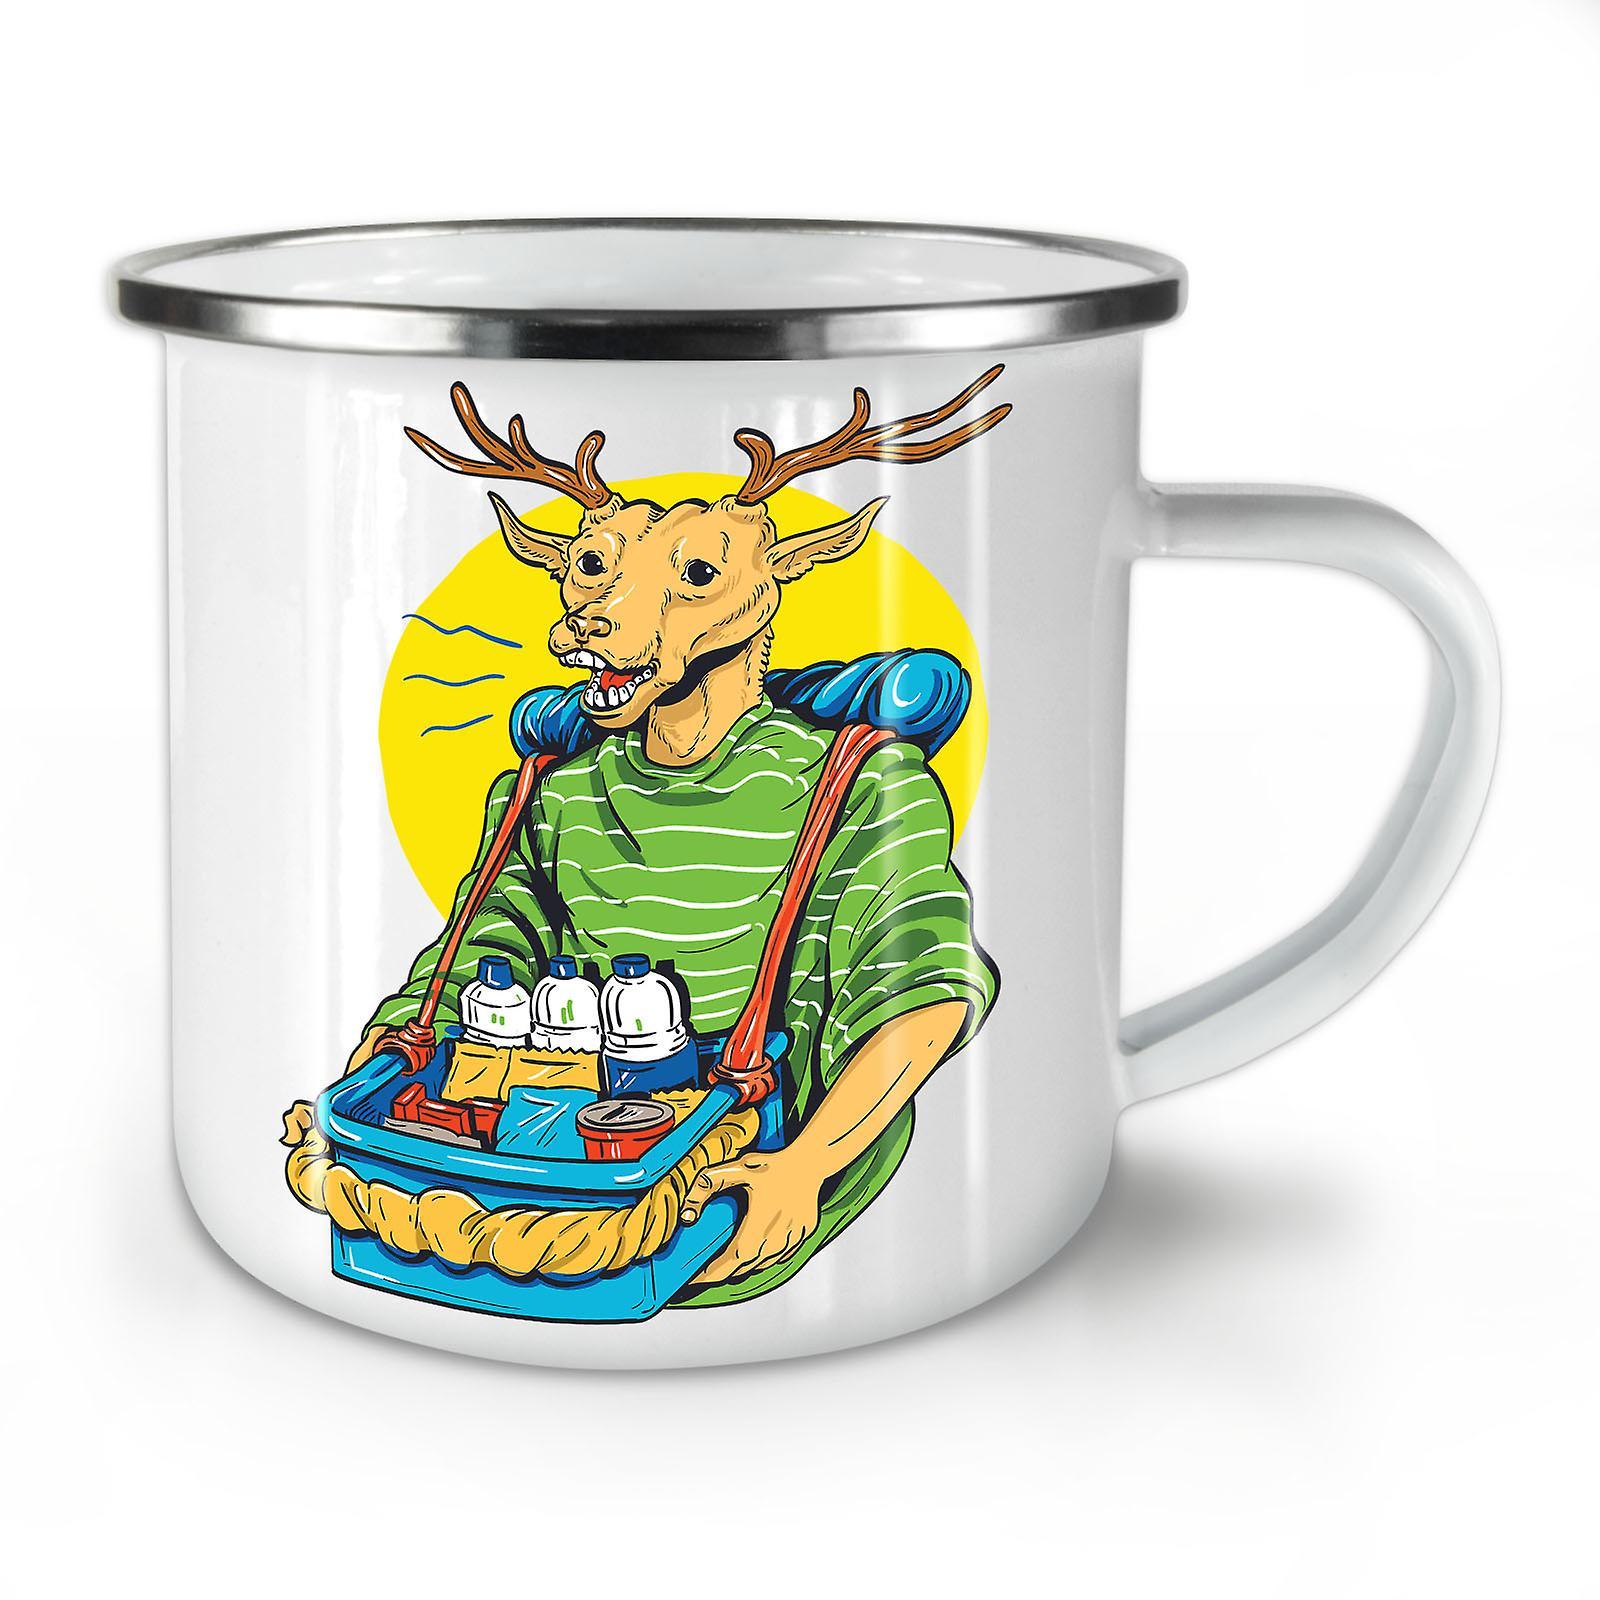 Nouveau OzWellcoda Deer Whitetea Émail Drôle Mug10 Café KT1cFJl